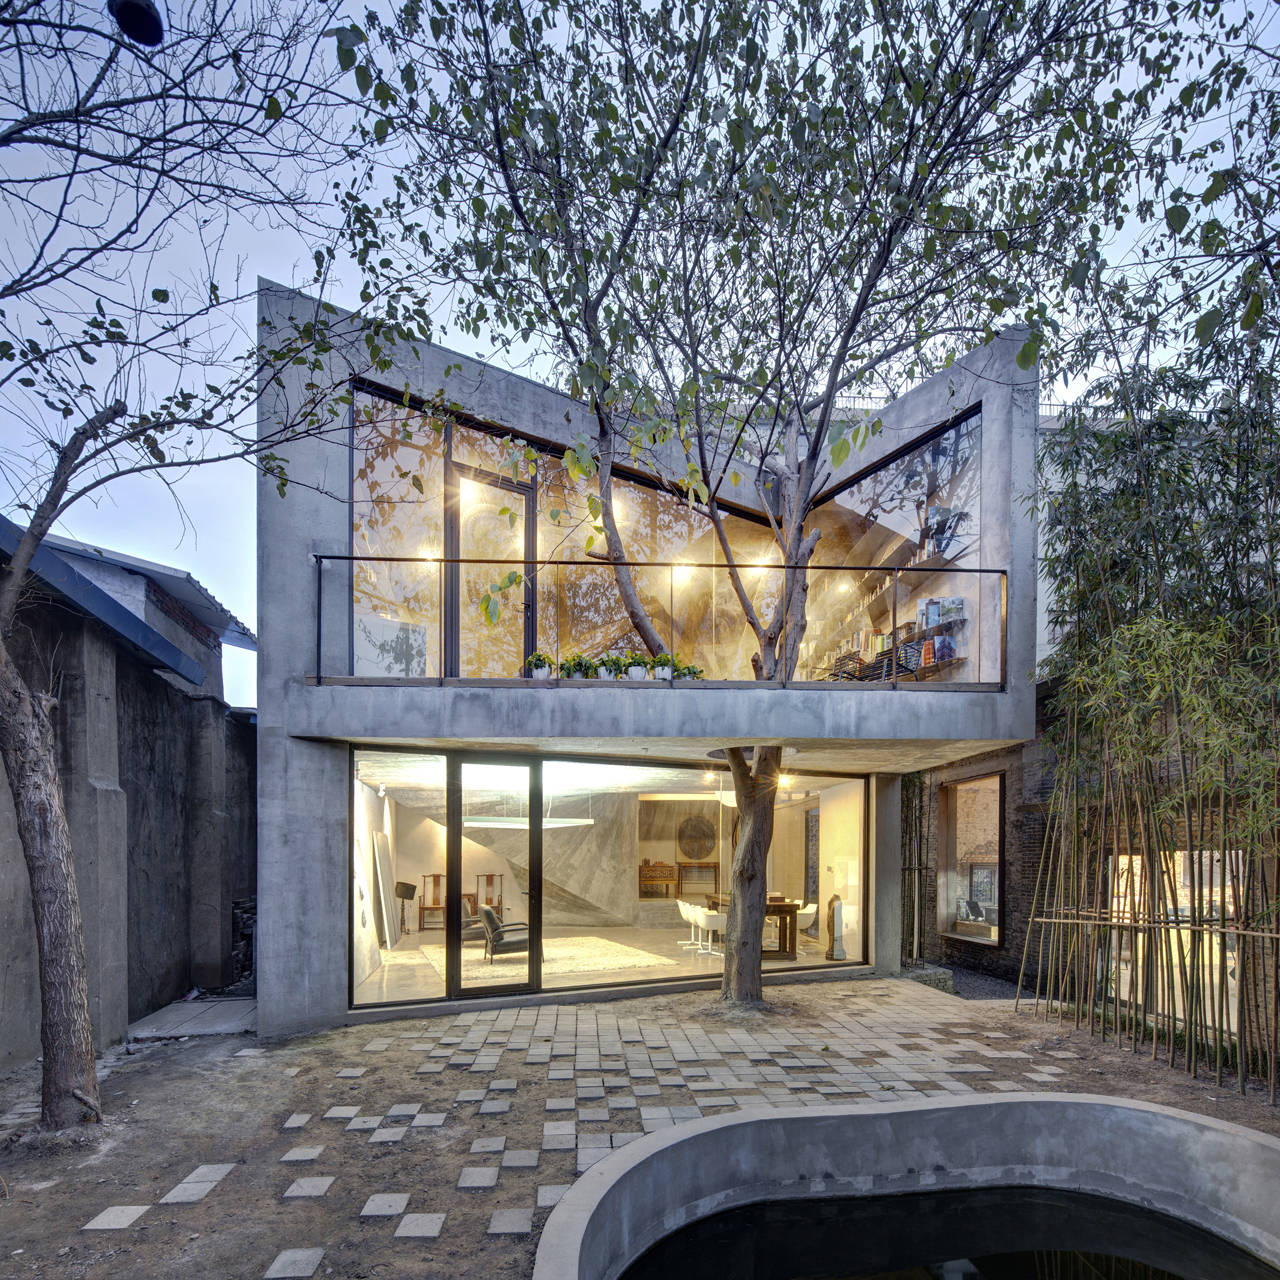 Casa de Chá / Archi-Union Architects, © Zhonghai Shen